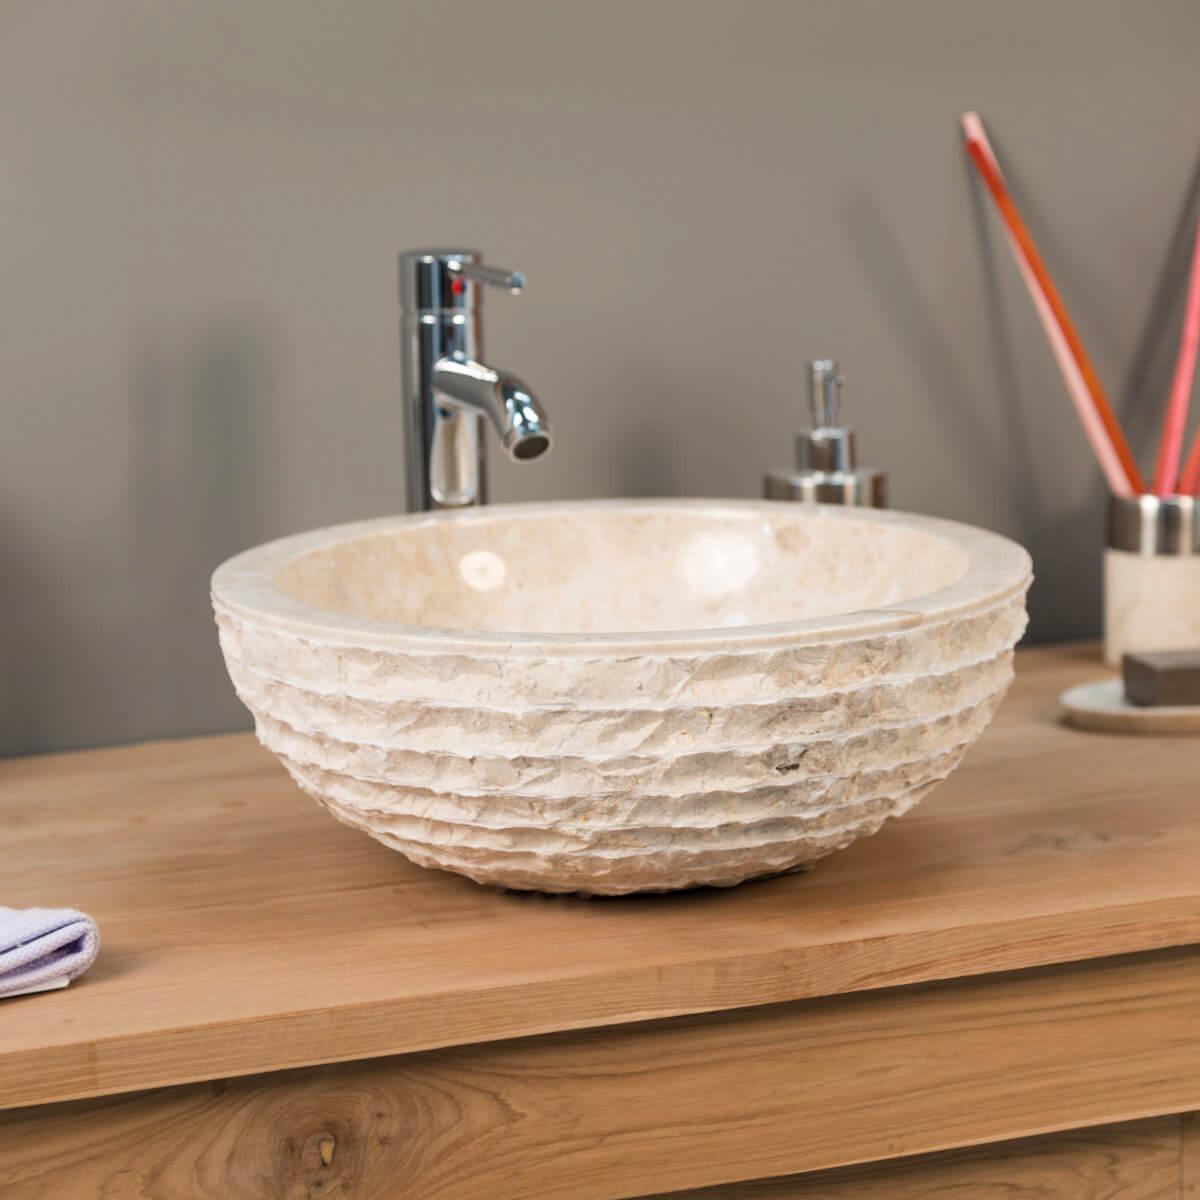 Lavabo Salle De Bain Ovale ~ lavabo 40 cm free best lavabo salle de bain castorama amazing house